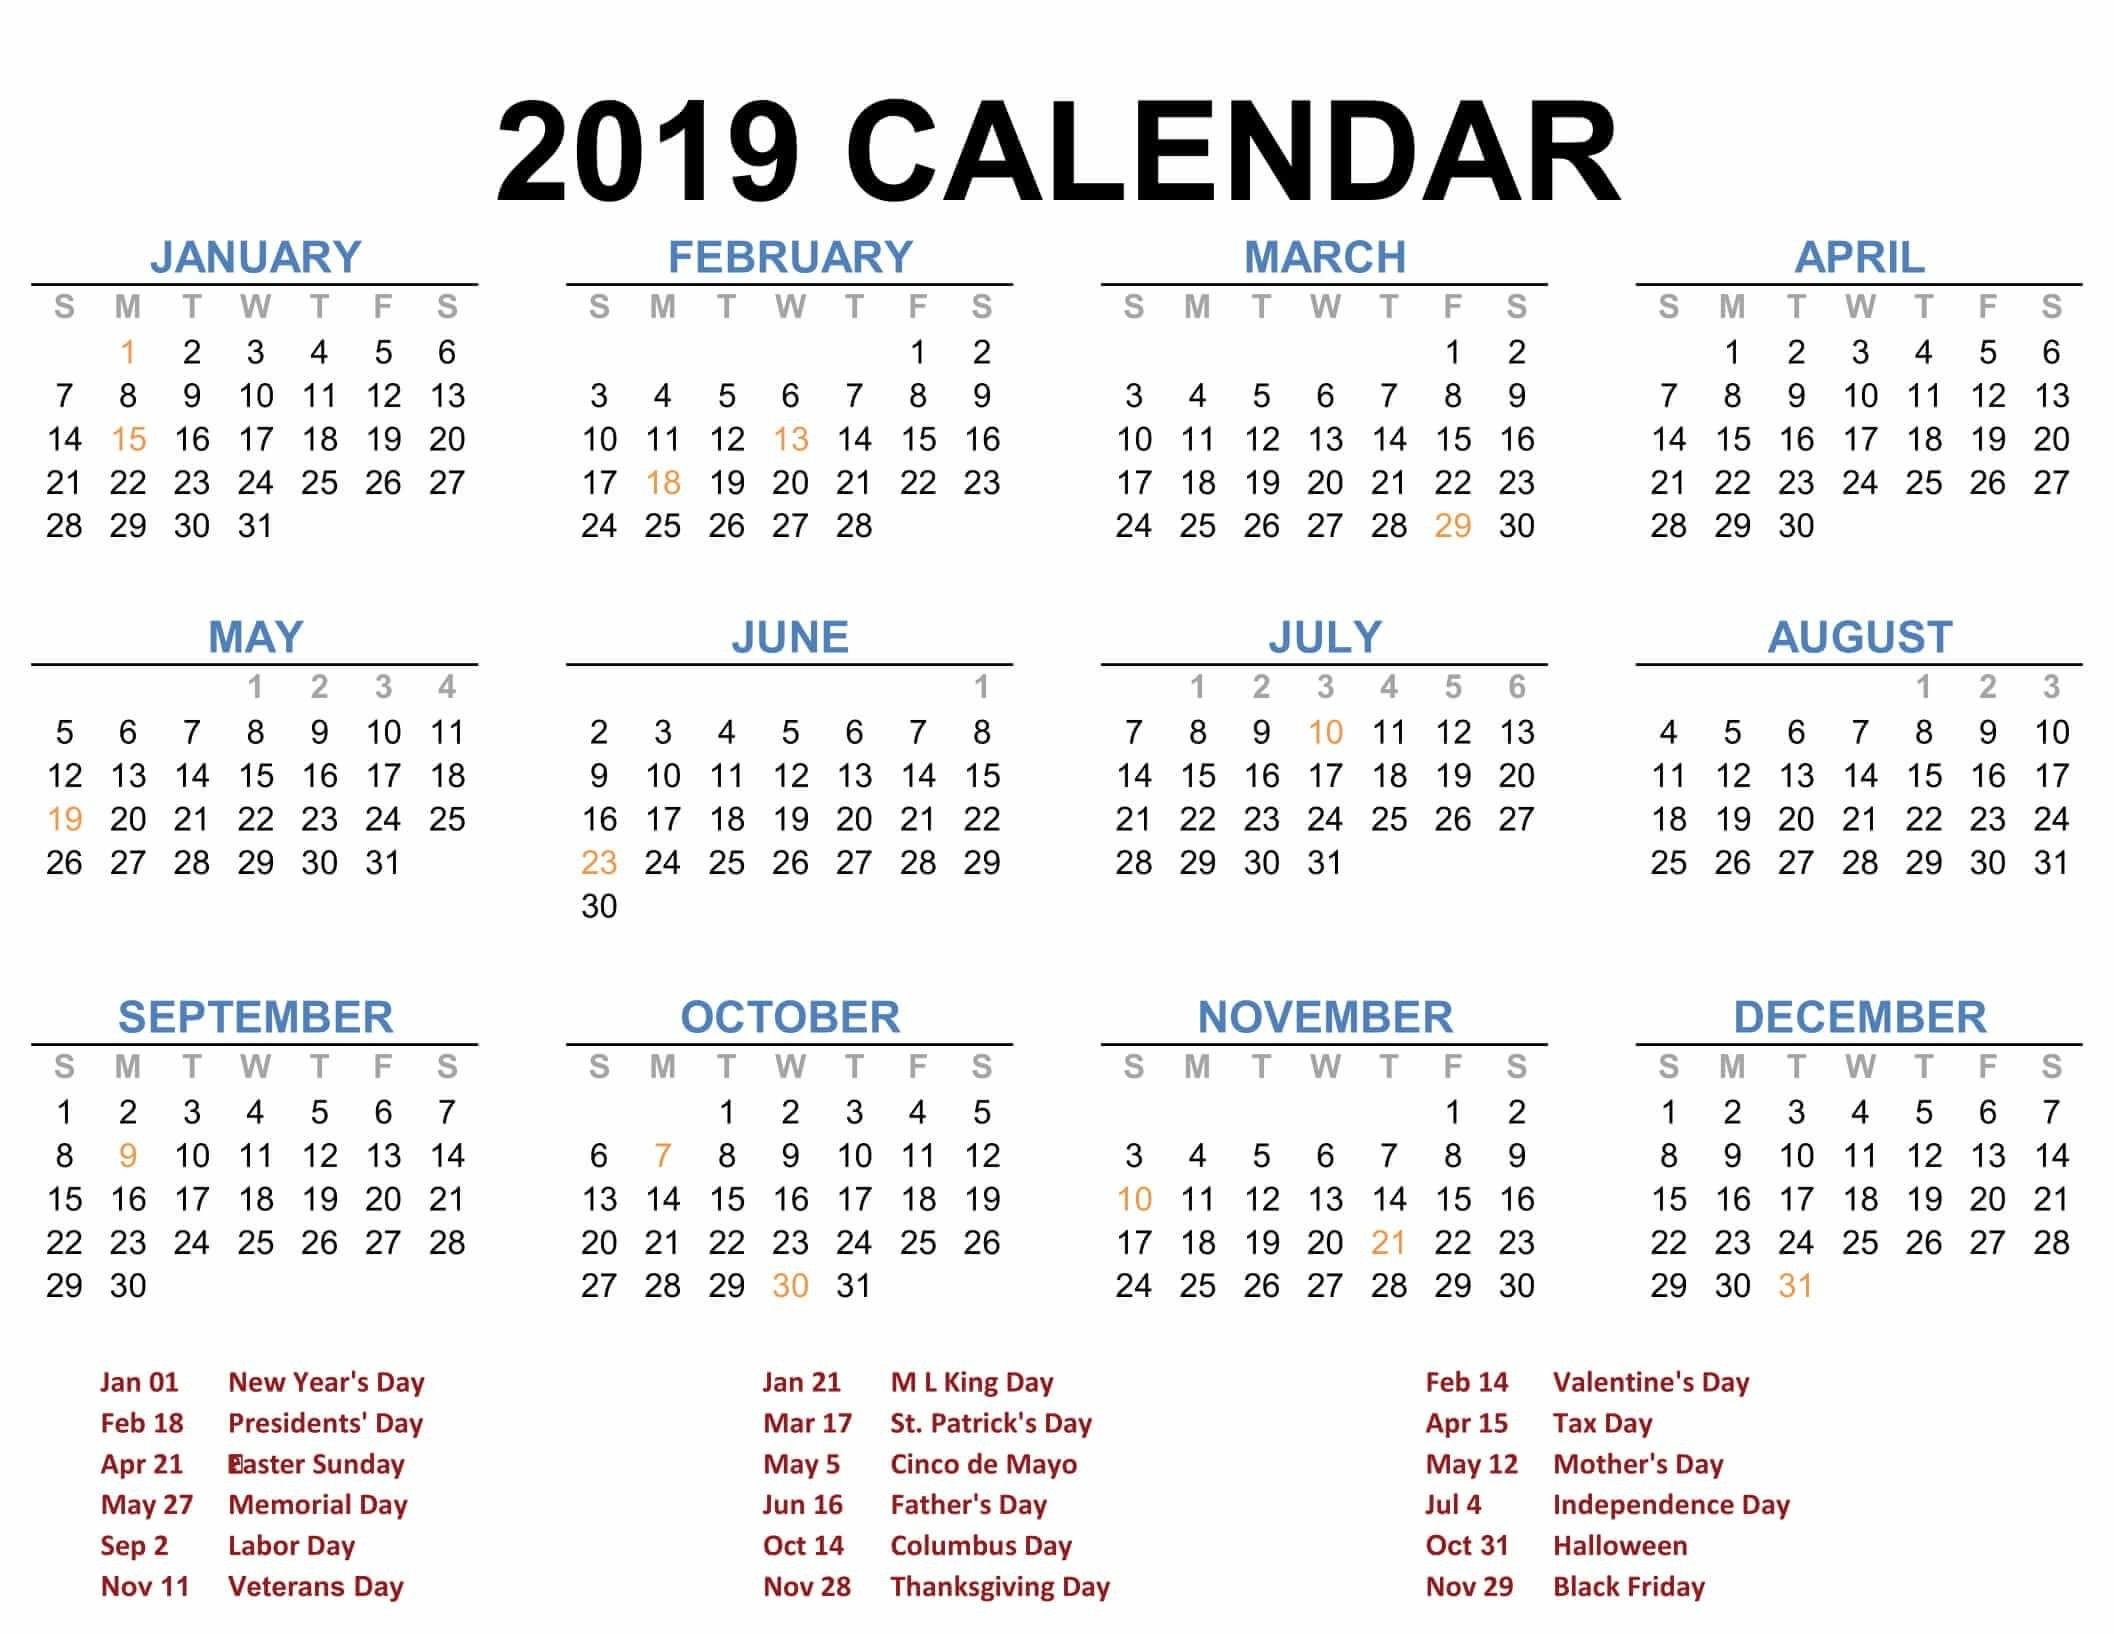 Calendar 2019 Blank Printable | ❤️creator Thyself ❤ | Calendar Calendar 2019 12